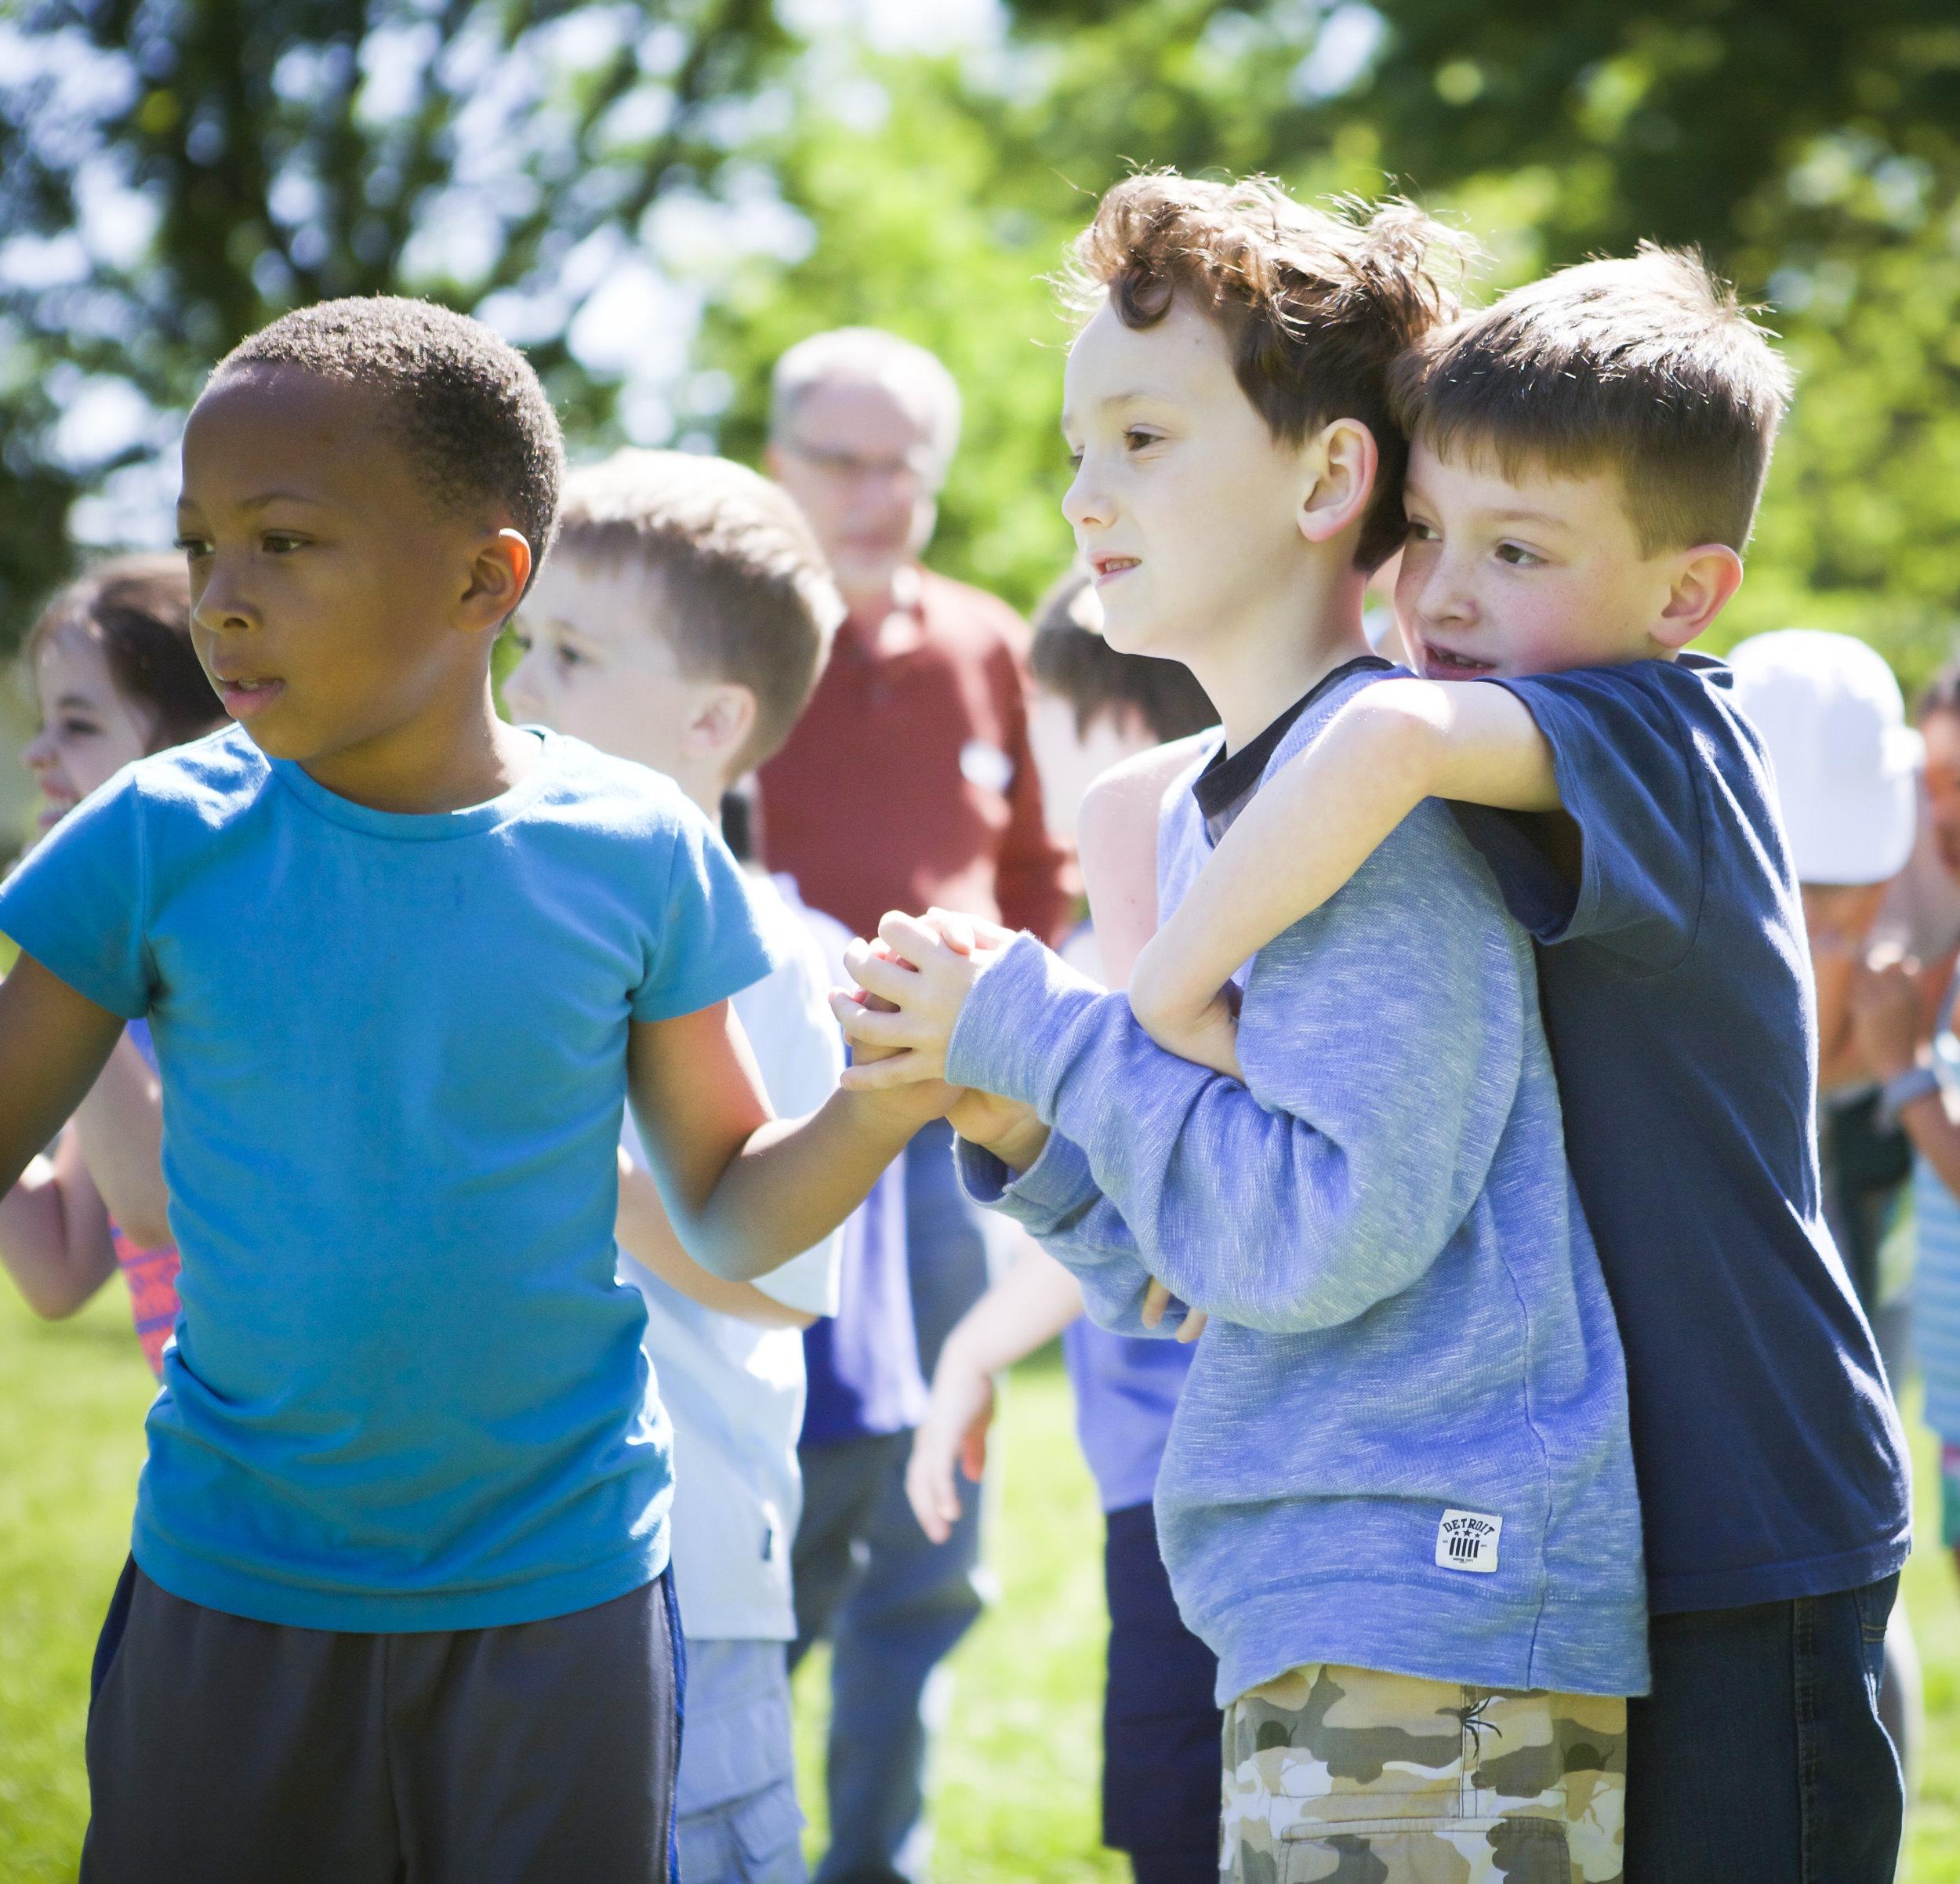 3 boys©2015 Julia Maloof Verderosa__2533.jpg